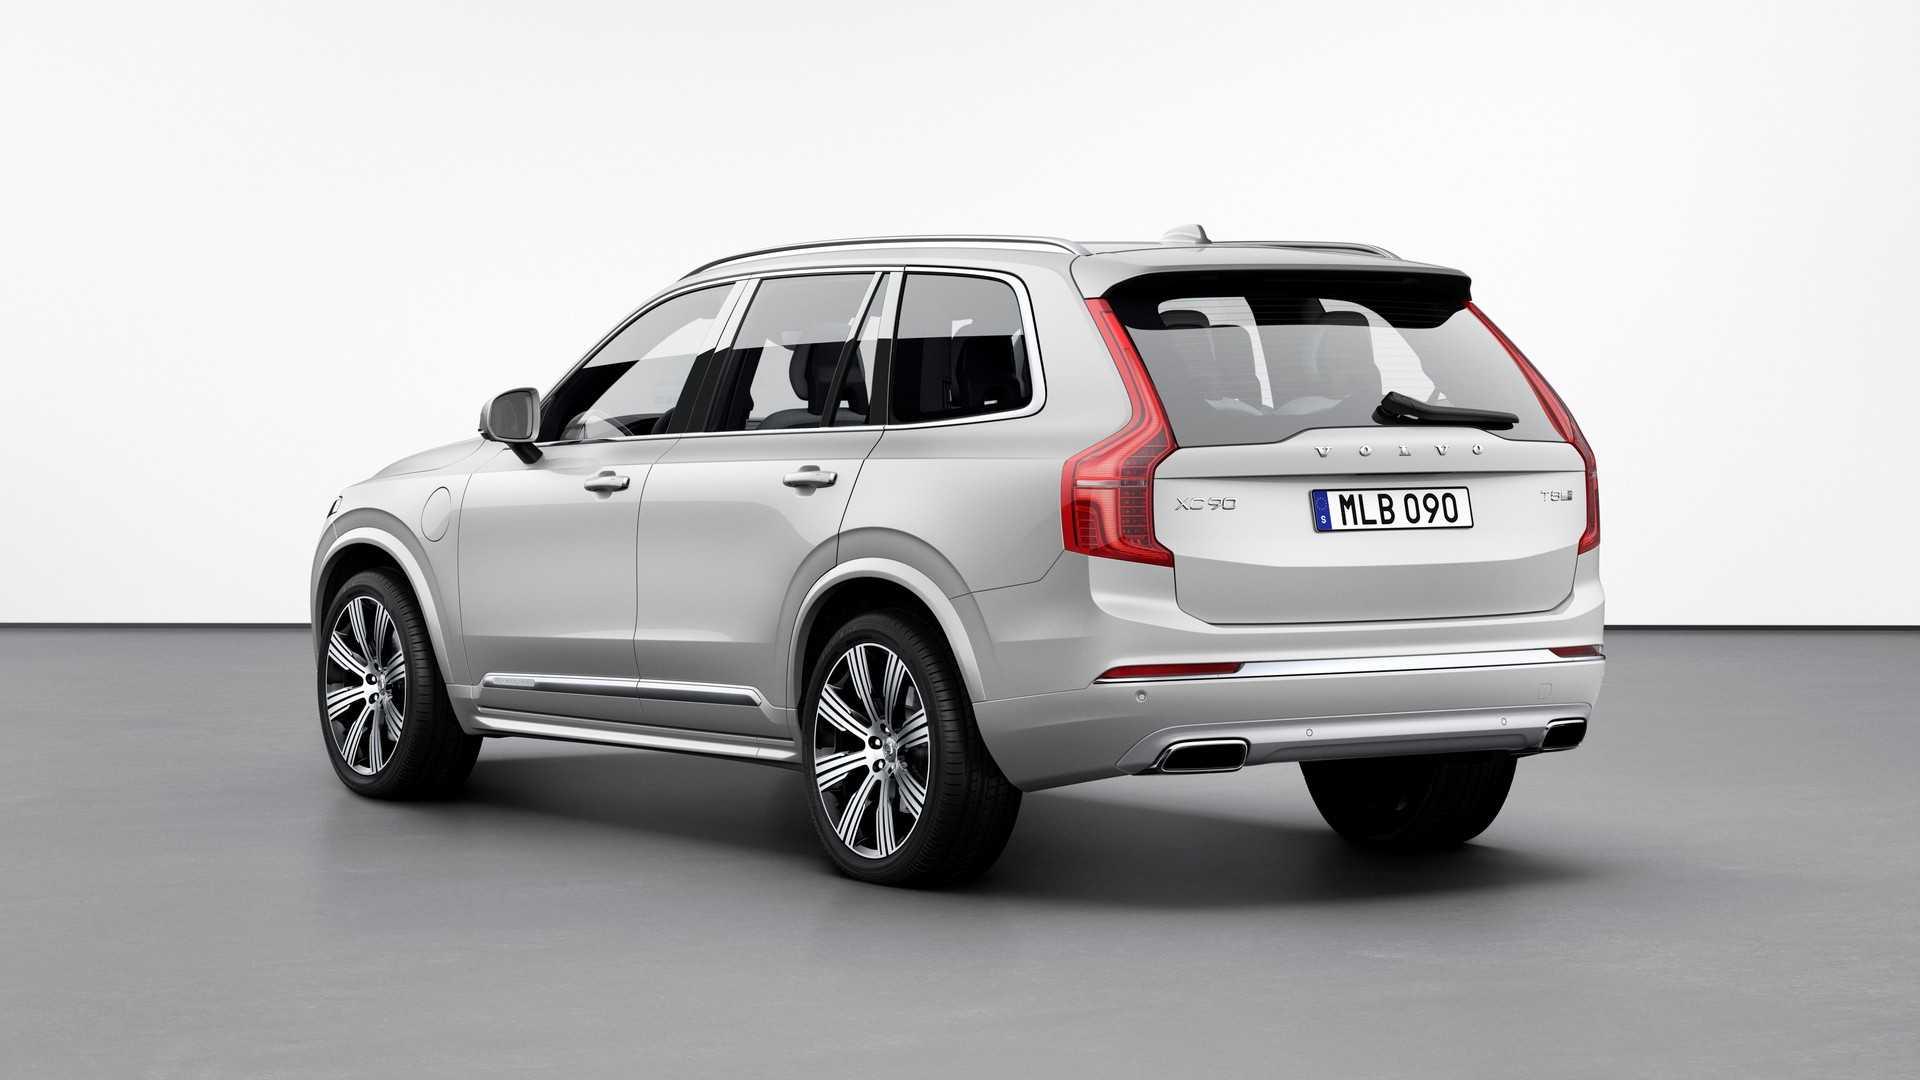 2021 Volvo XC90 rear view